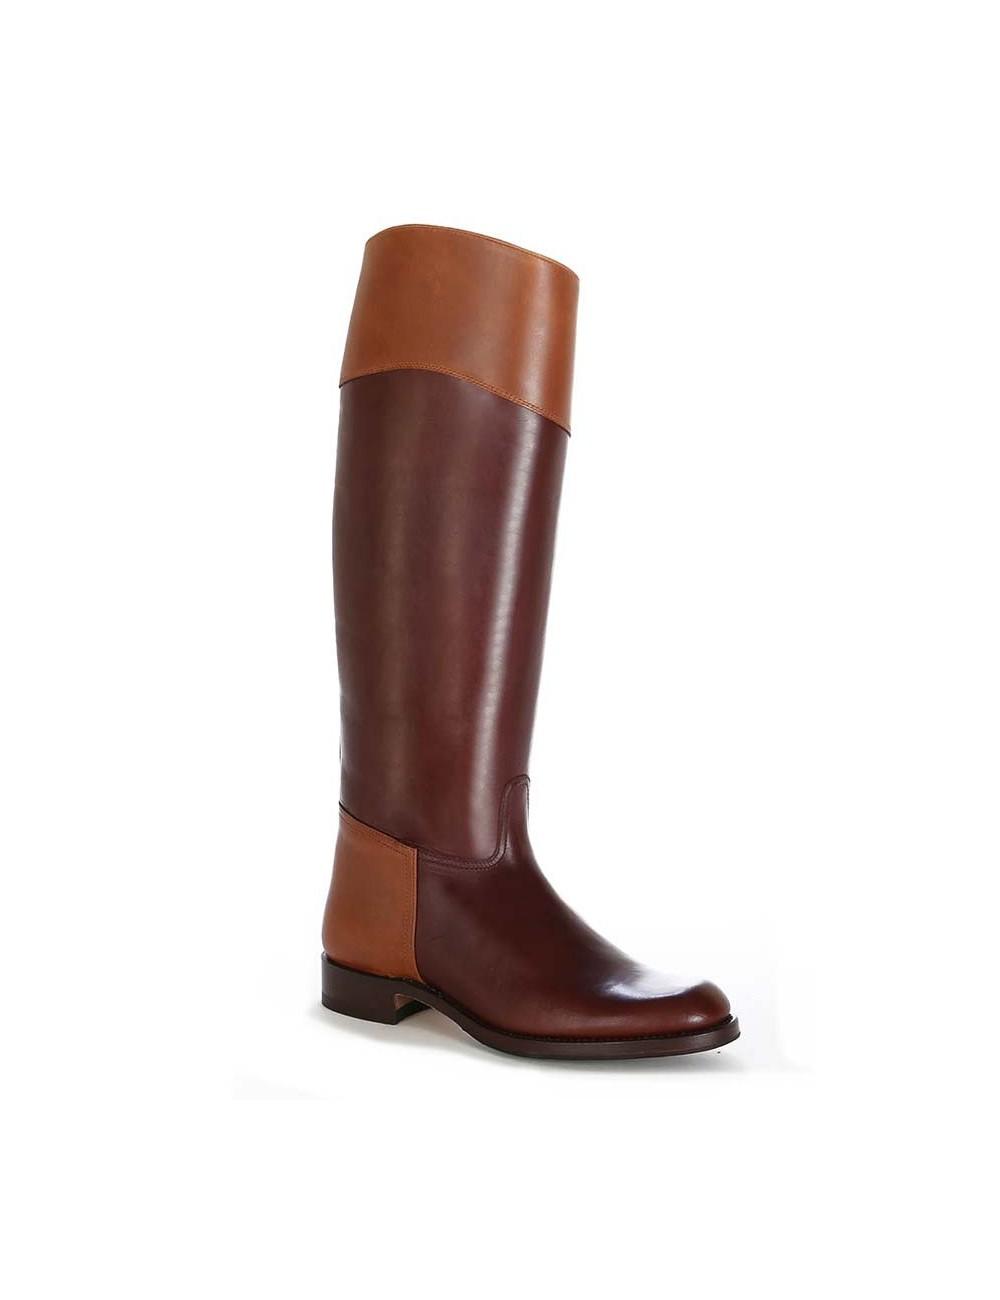 Bottes cavalières marron cuir bicolore - Bottes cavalières artisanales